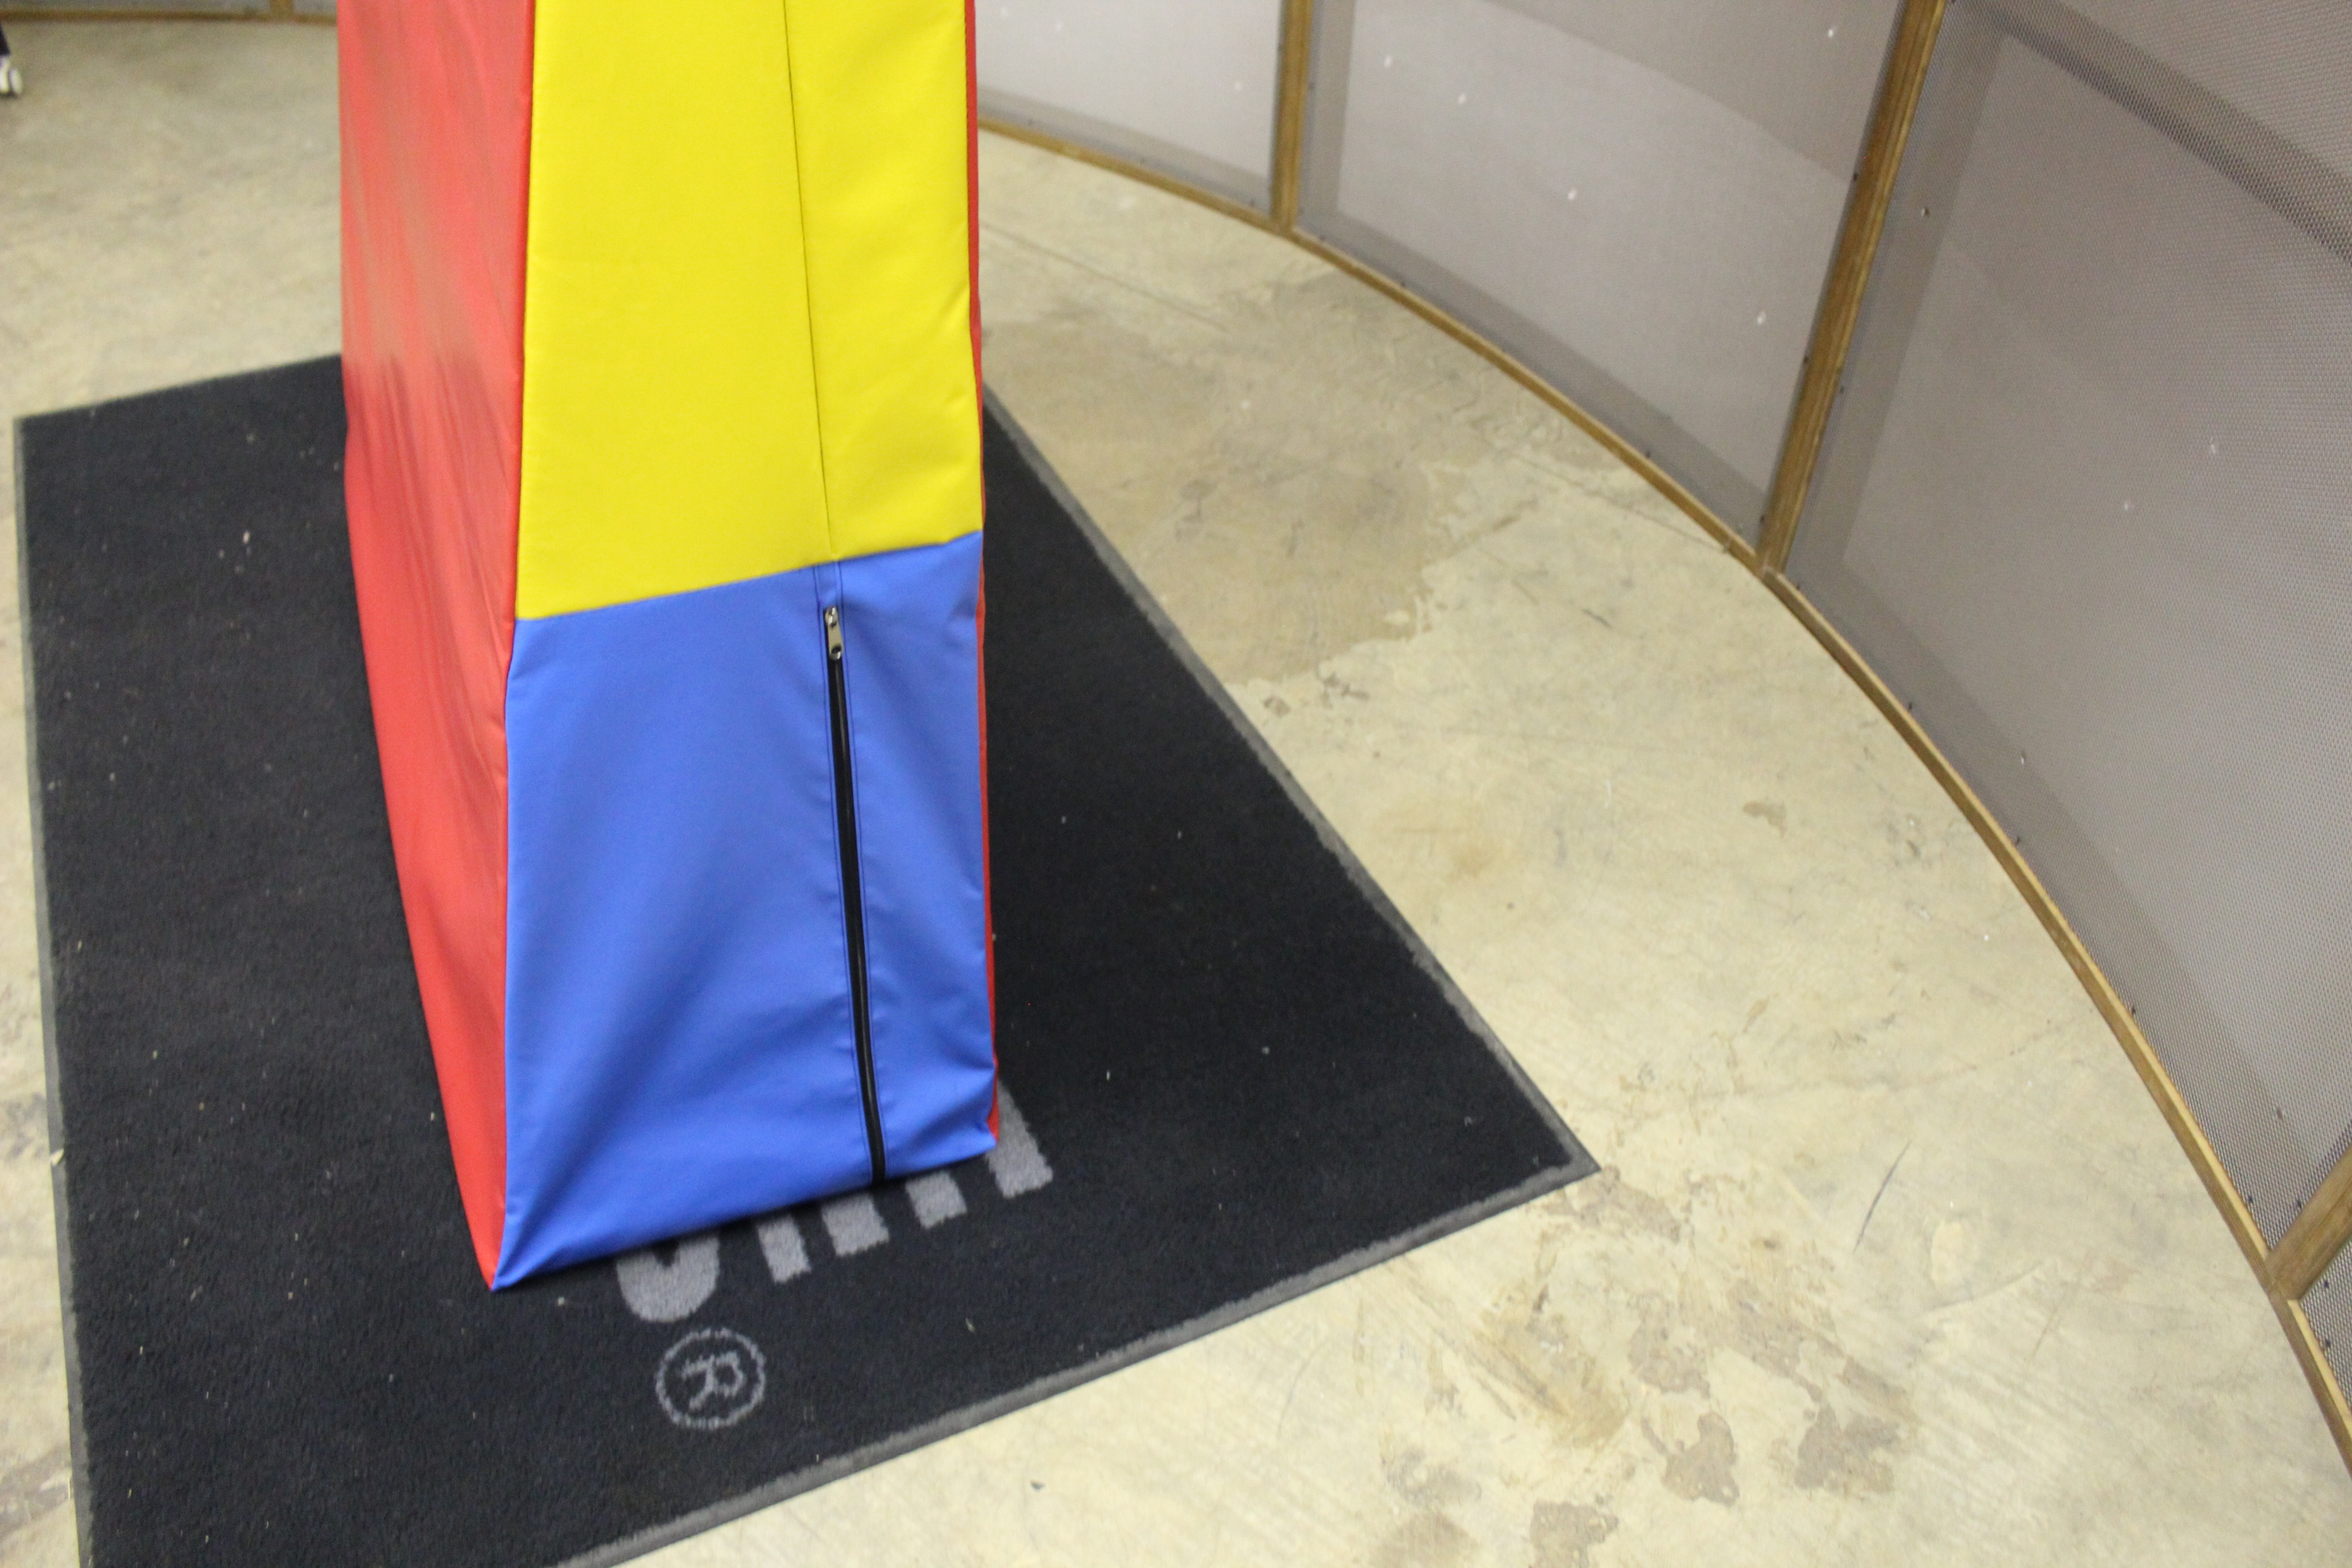 tumbling mats wedge x com skill cheese shape ip best choice walmart products mat folding incline gymnastics